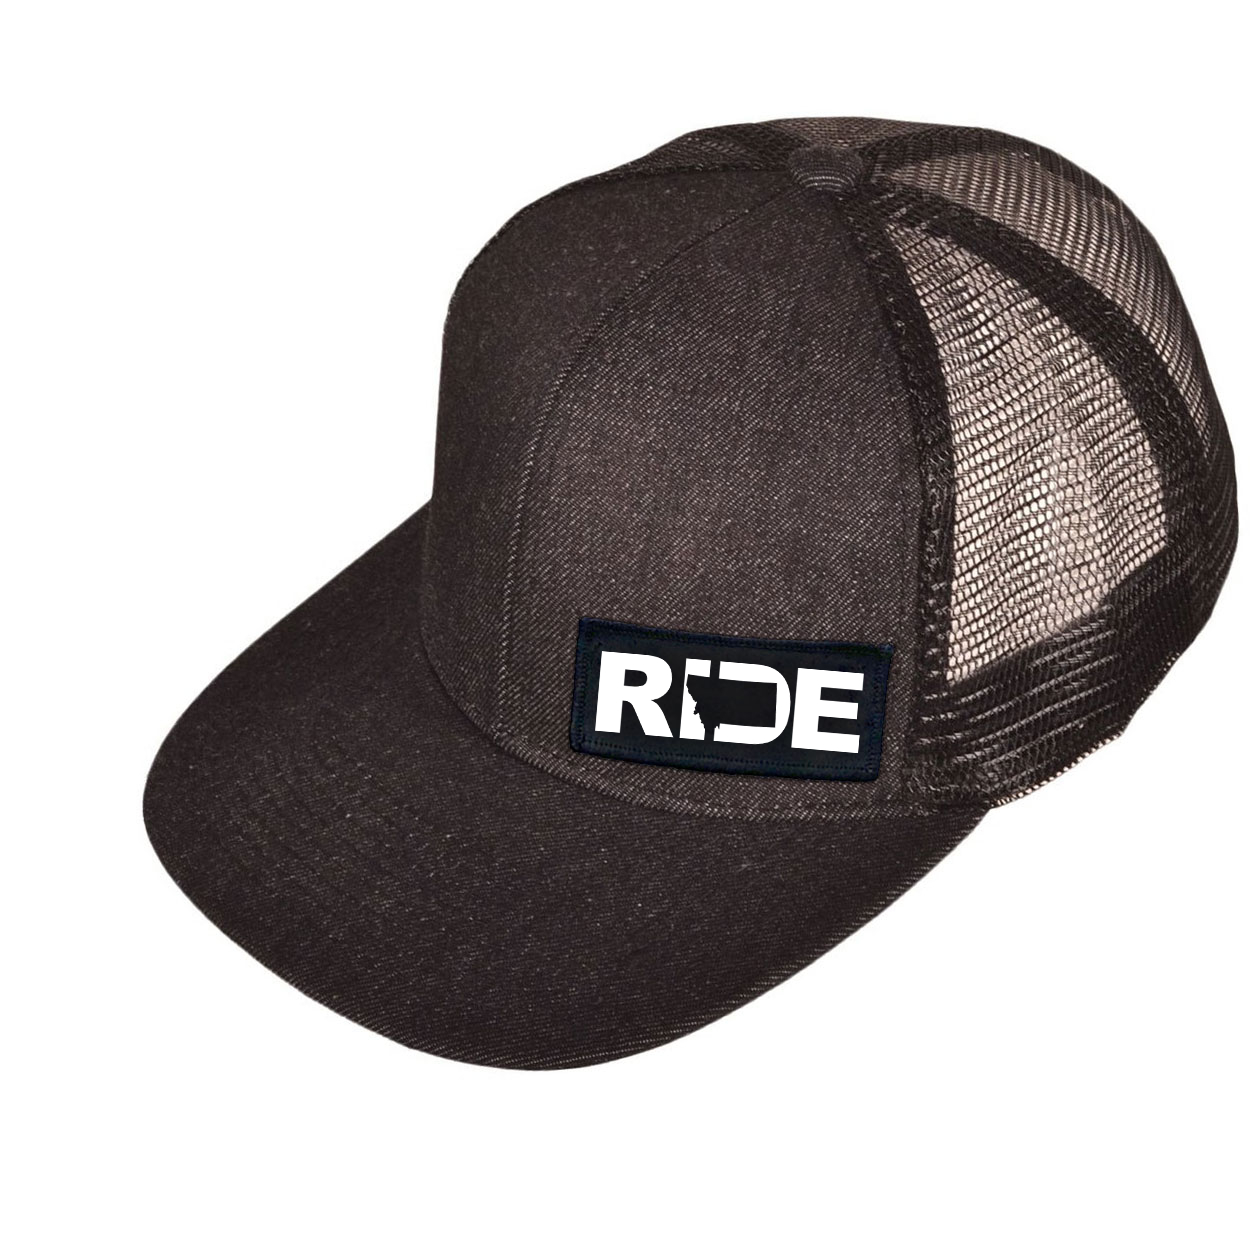 Ride Montana Night Out Woven Patch Snapback Flat Brim Hat Black Denim (White Logo)